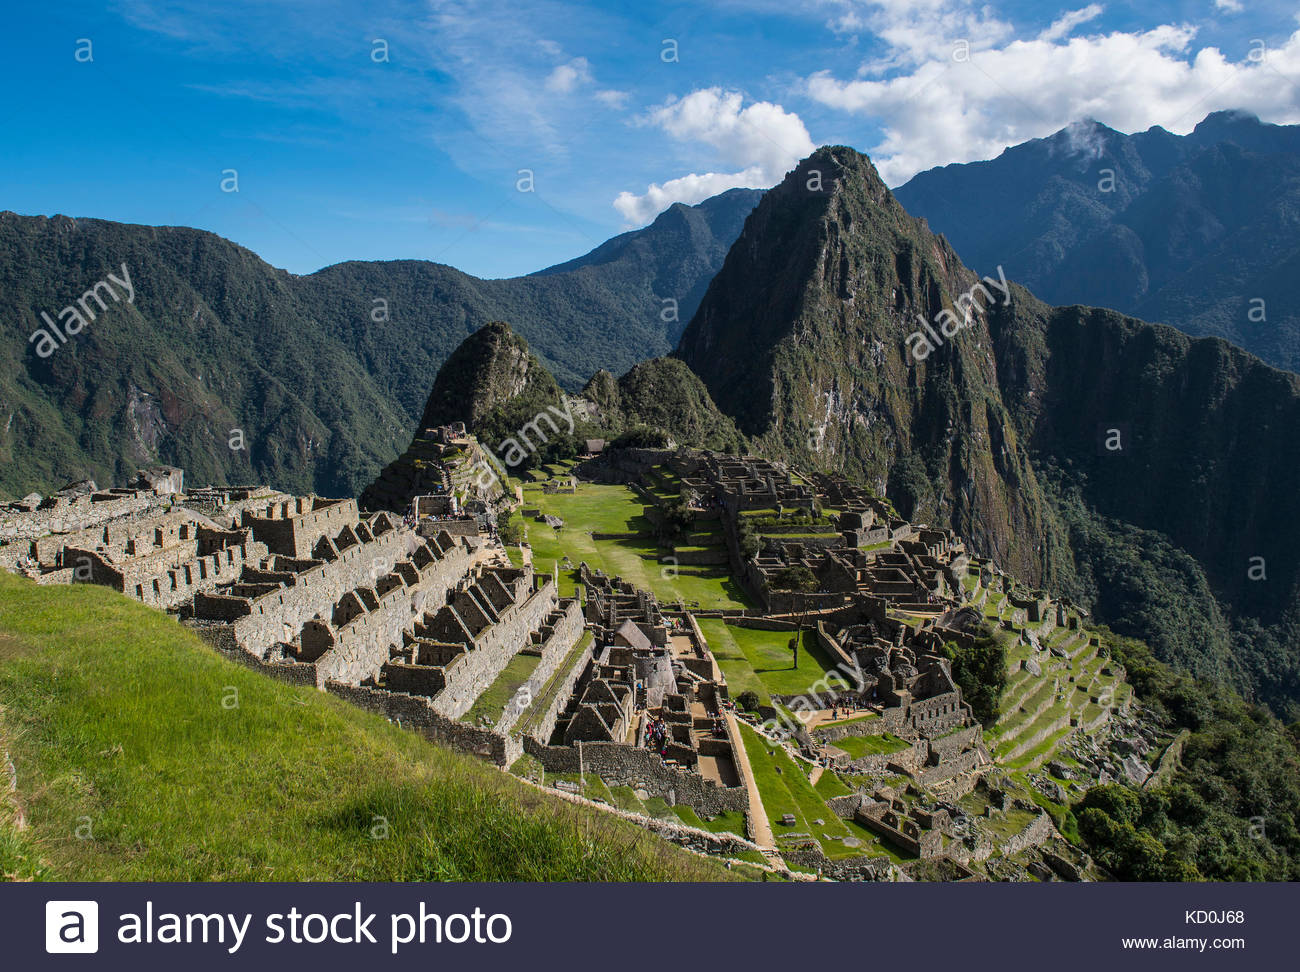 Ansicht von Inka Ruinen, Machu Picchu, Cusco, Peru, Südamerika Stockbild